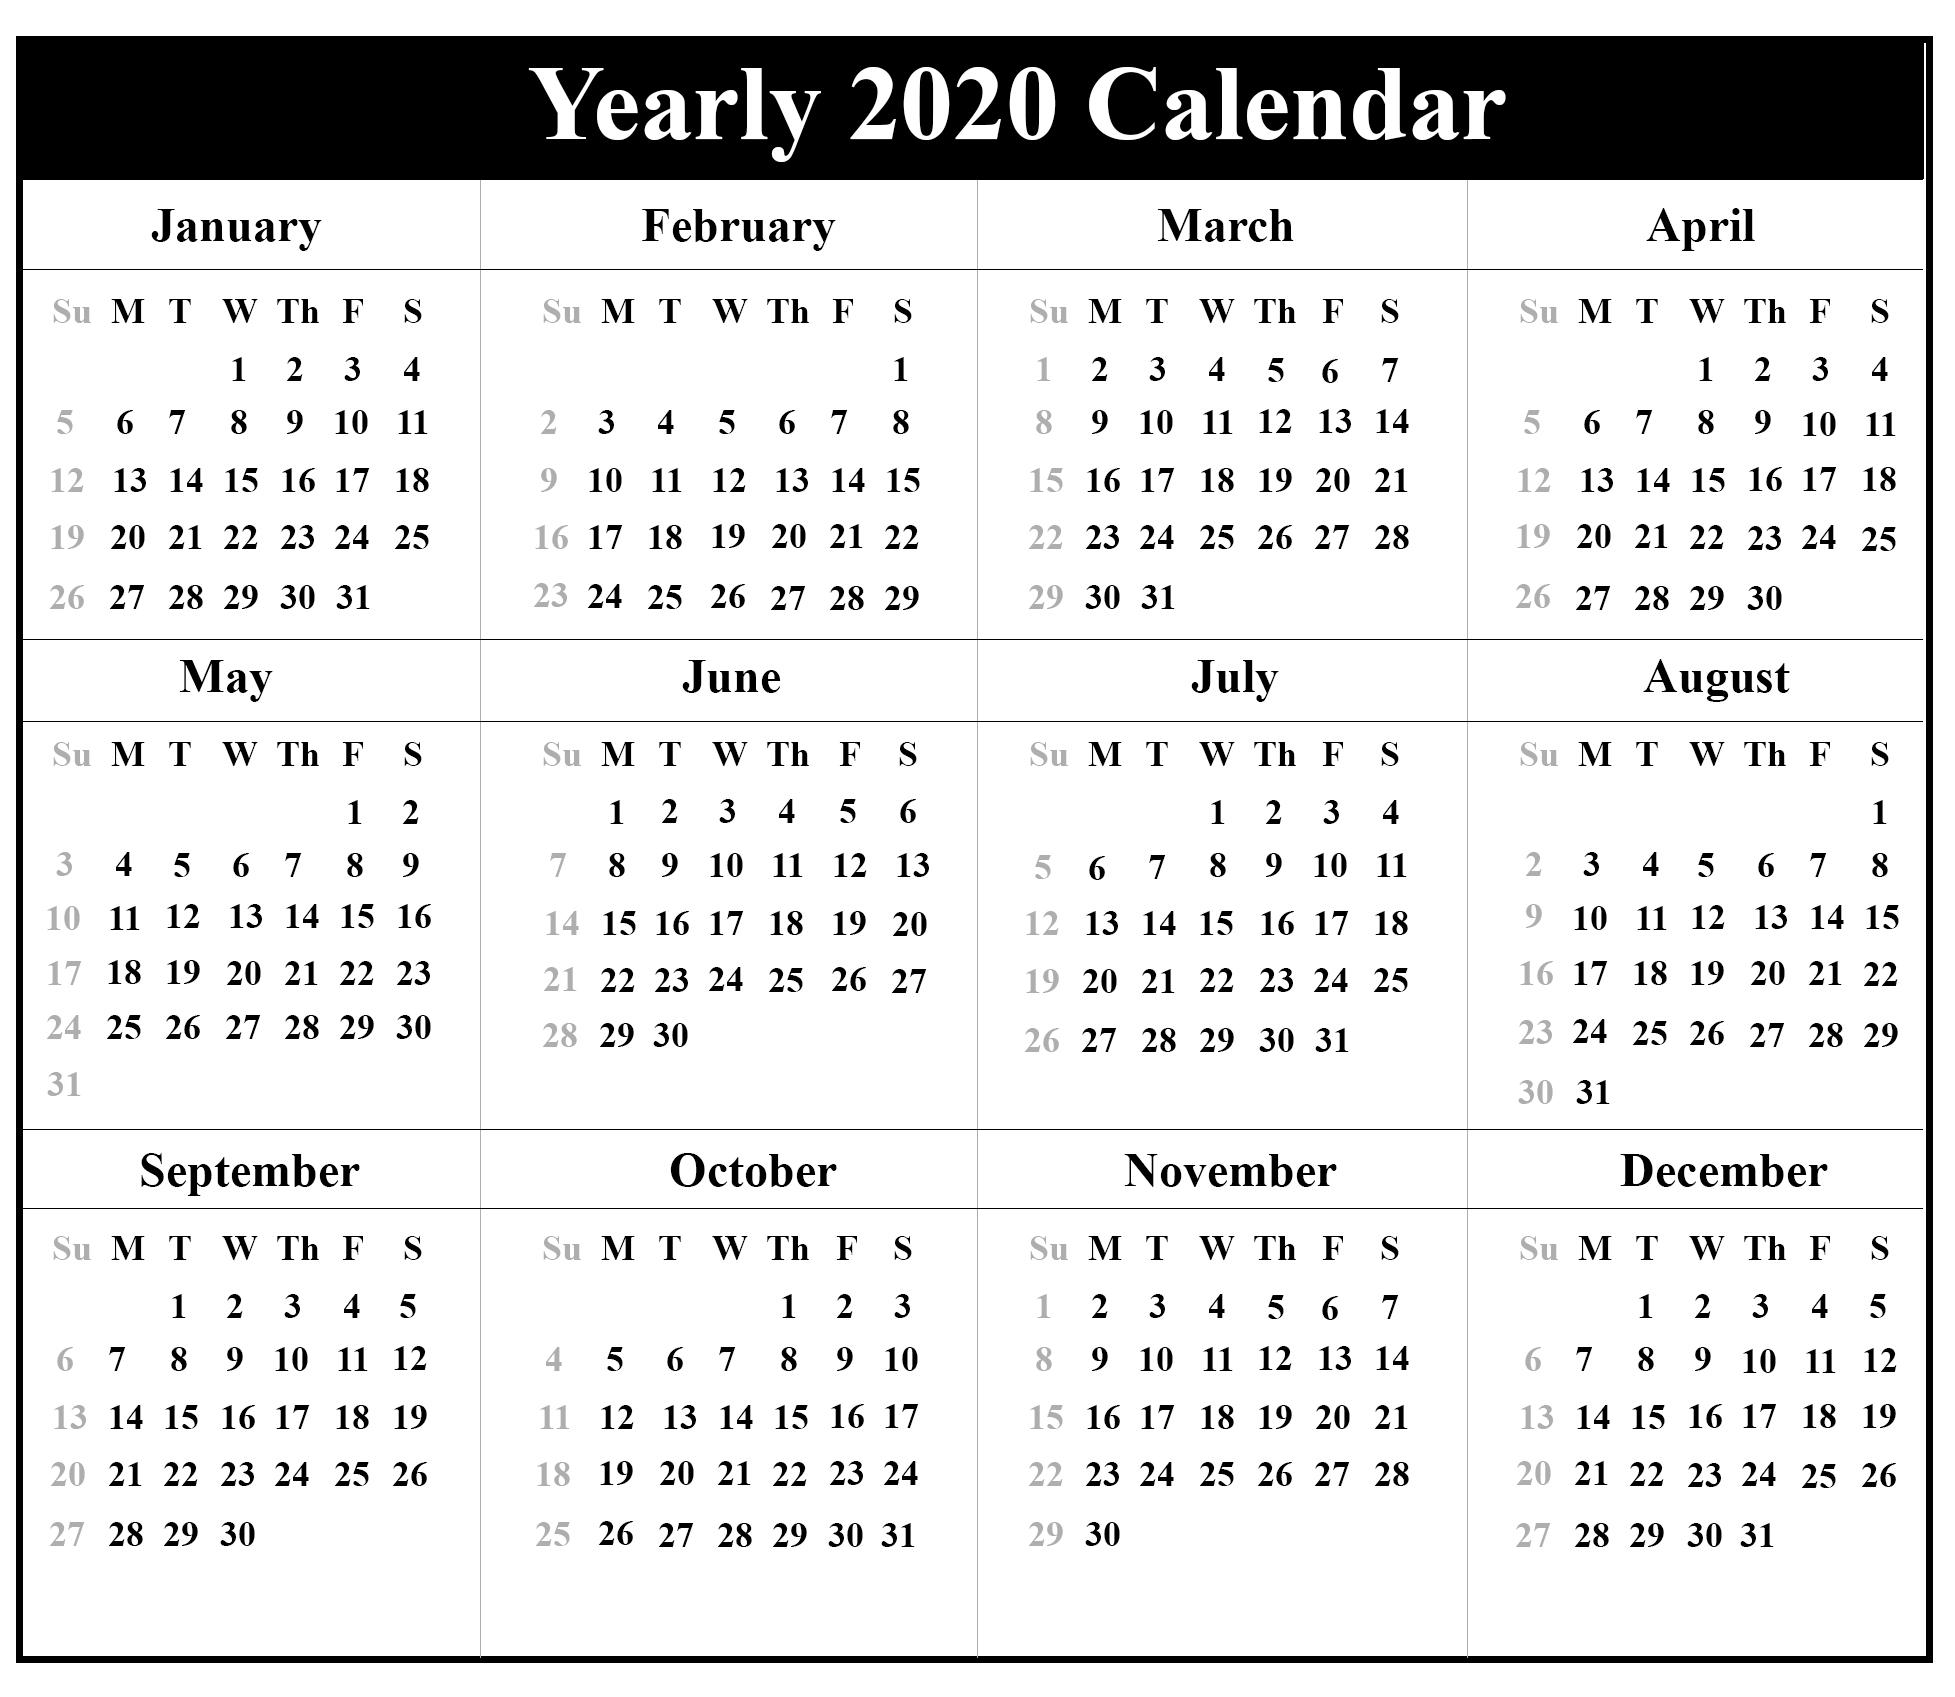 Free Printable Pocket Calendars 2021   Calendar Printables inside 2021 Pocket Planner: Yearly Calendar